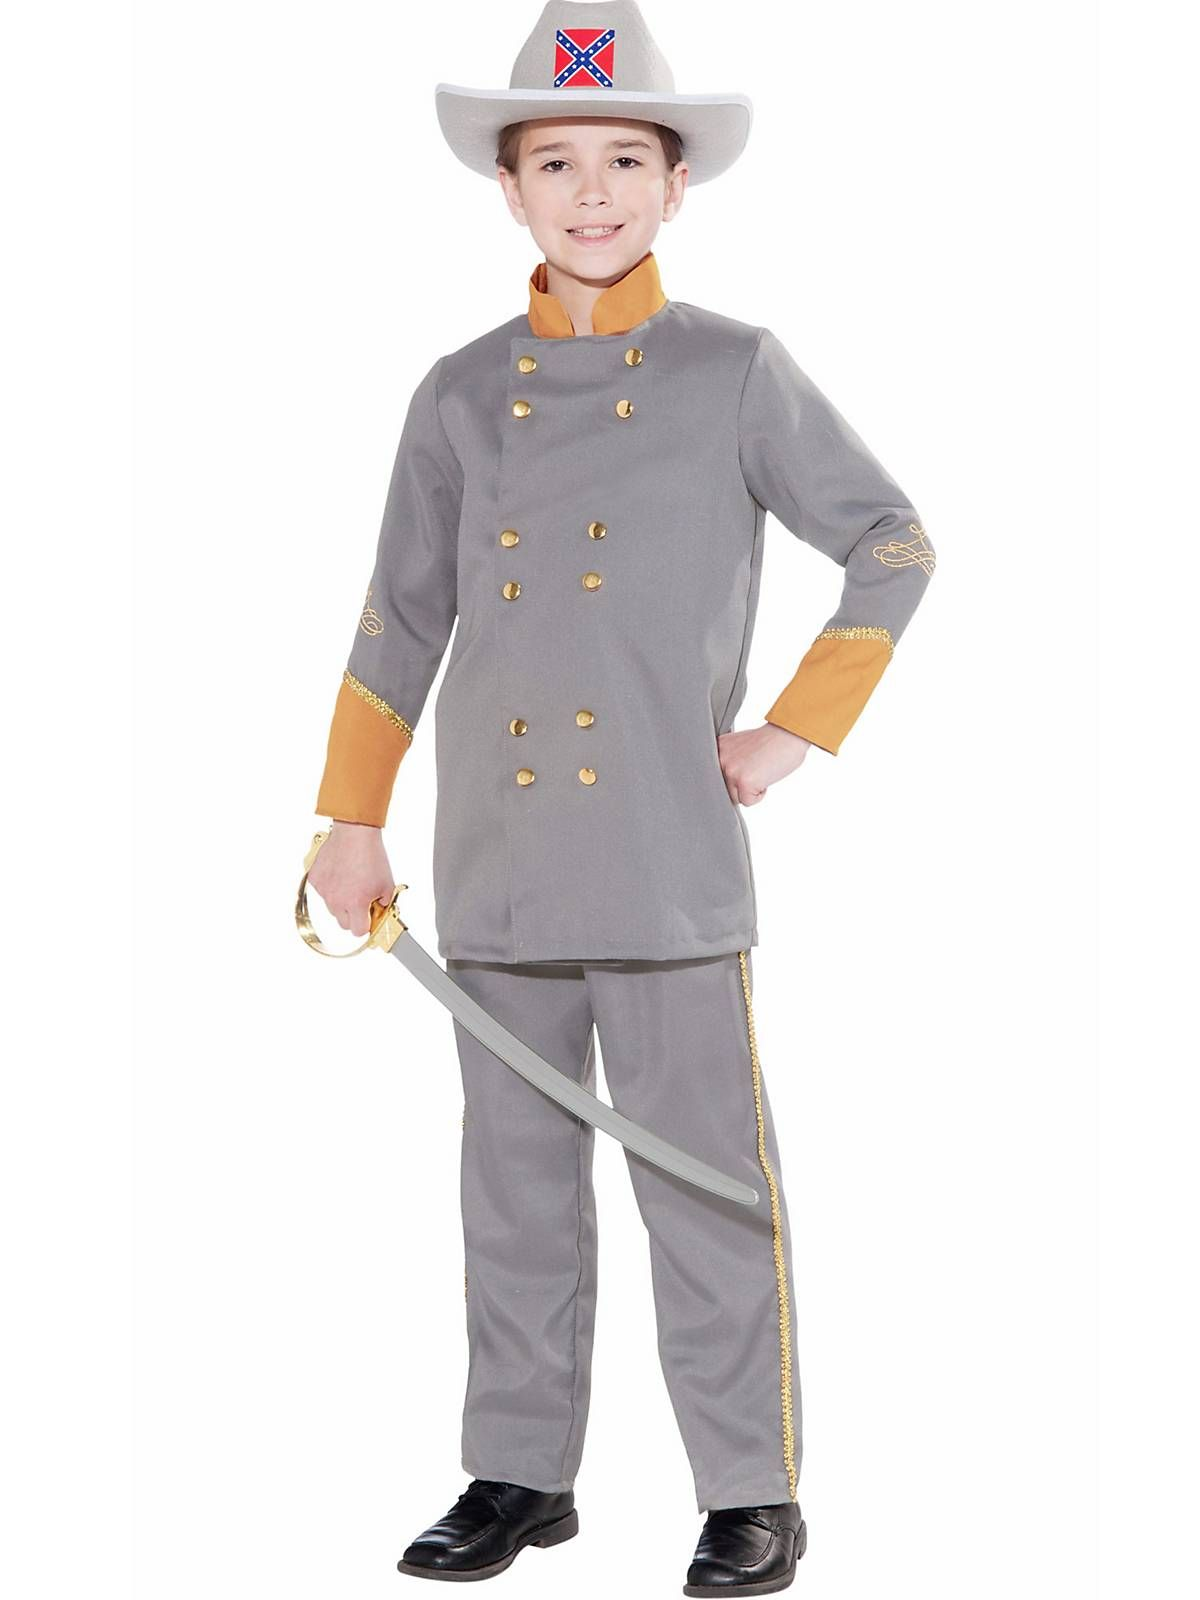 Large Adult Men's Gray Confederate Officer Uniform Civil War Costume Southern Uniform MDJWG6e